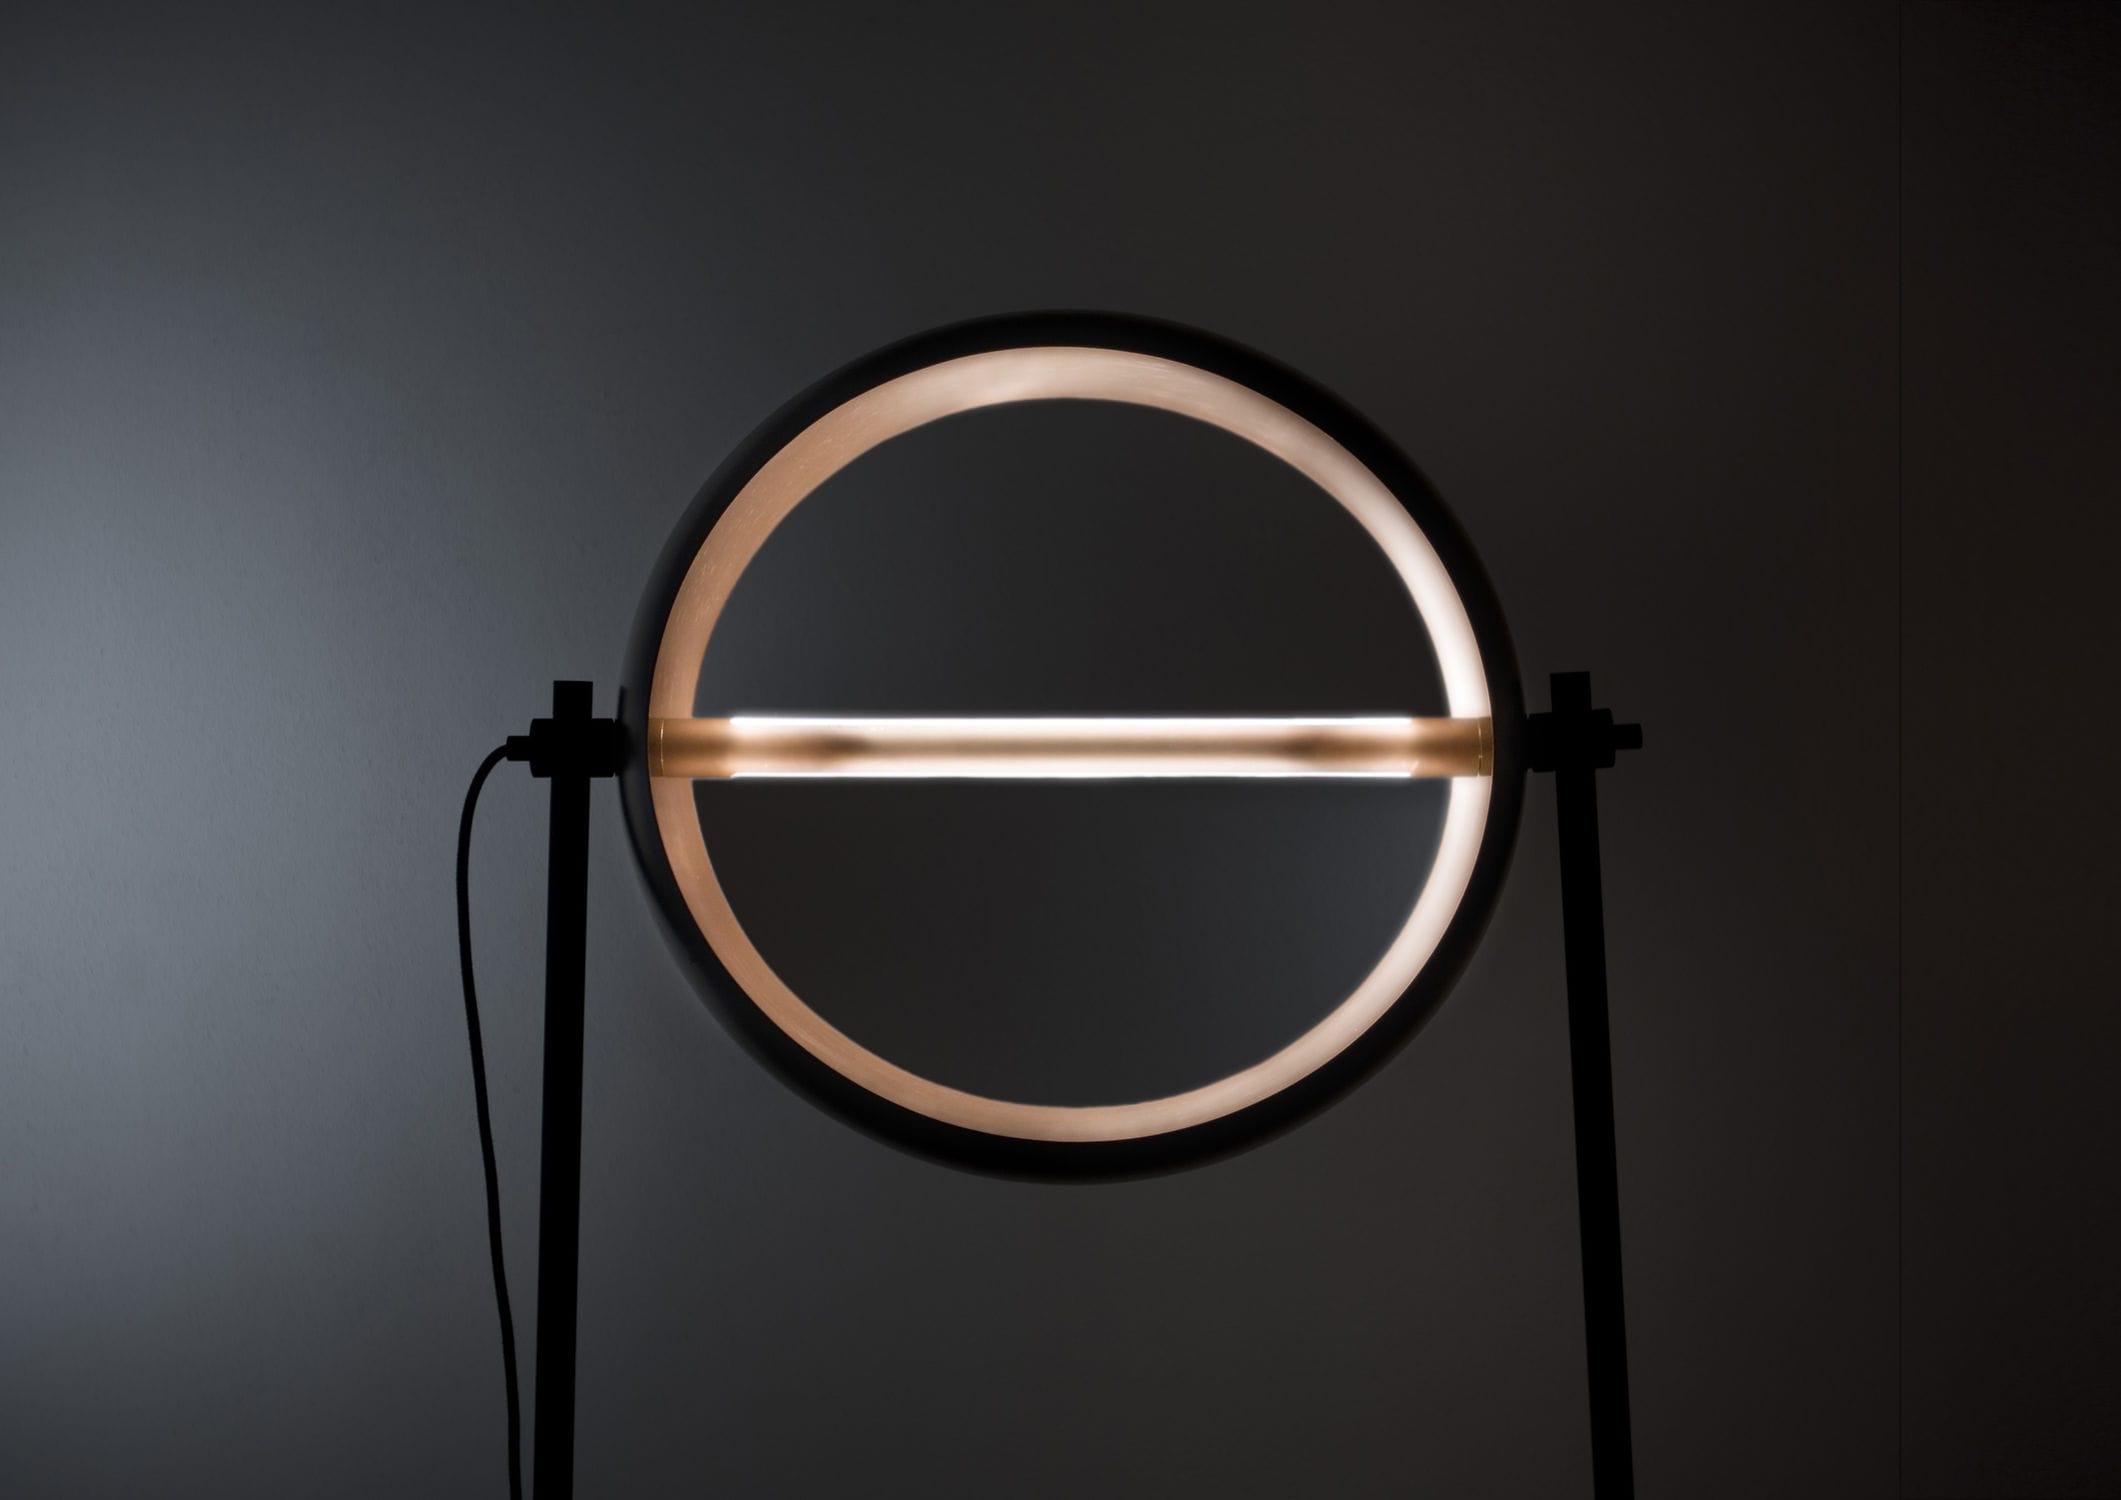 Lampada In Rame Design : Lampada in rame scandinavia anni in vendita su pamono